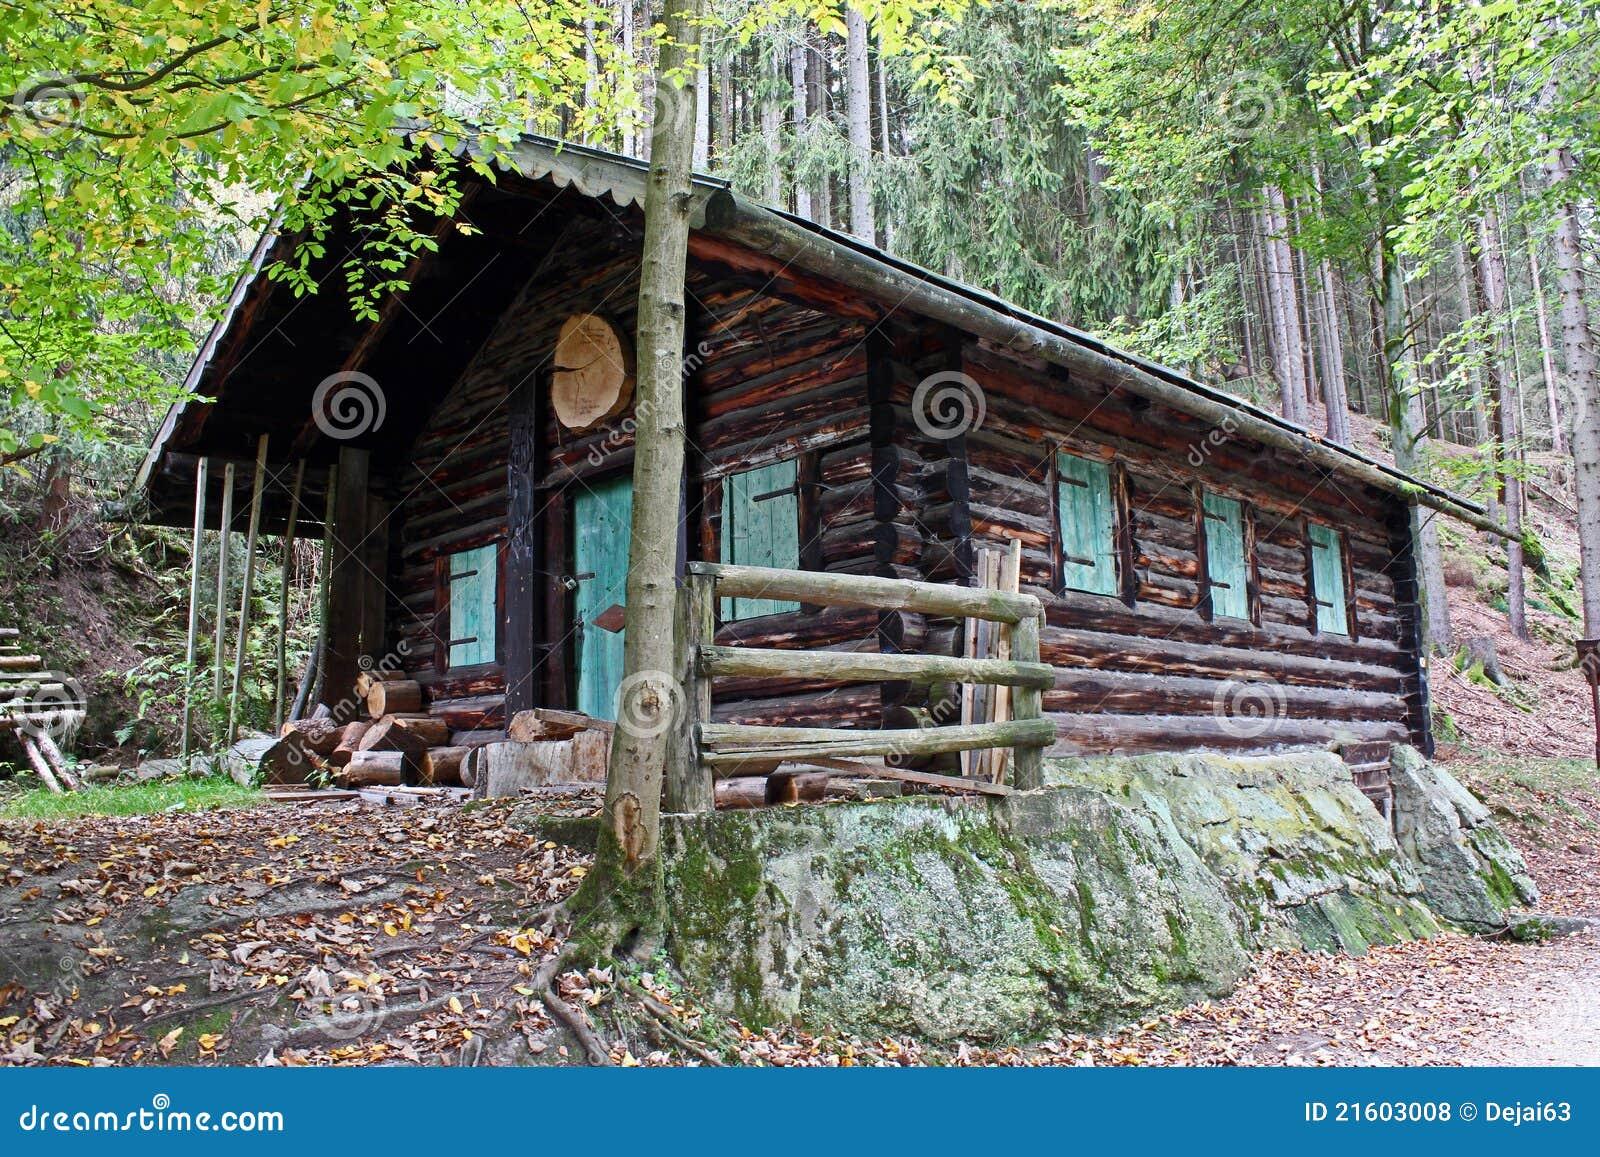 Log Cabin Royalty Free Stock Photos Image 21603008